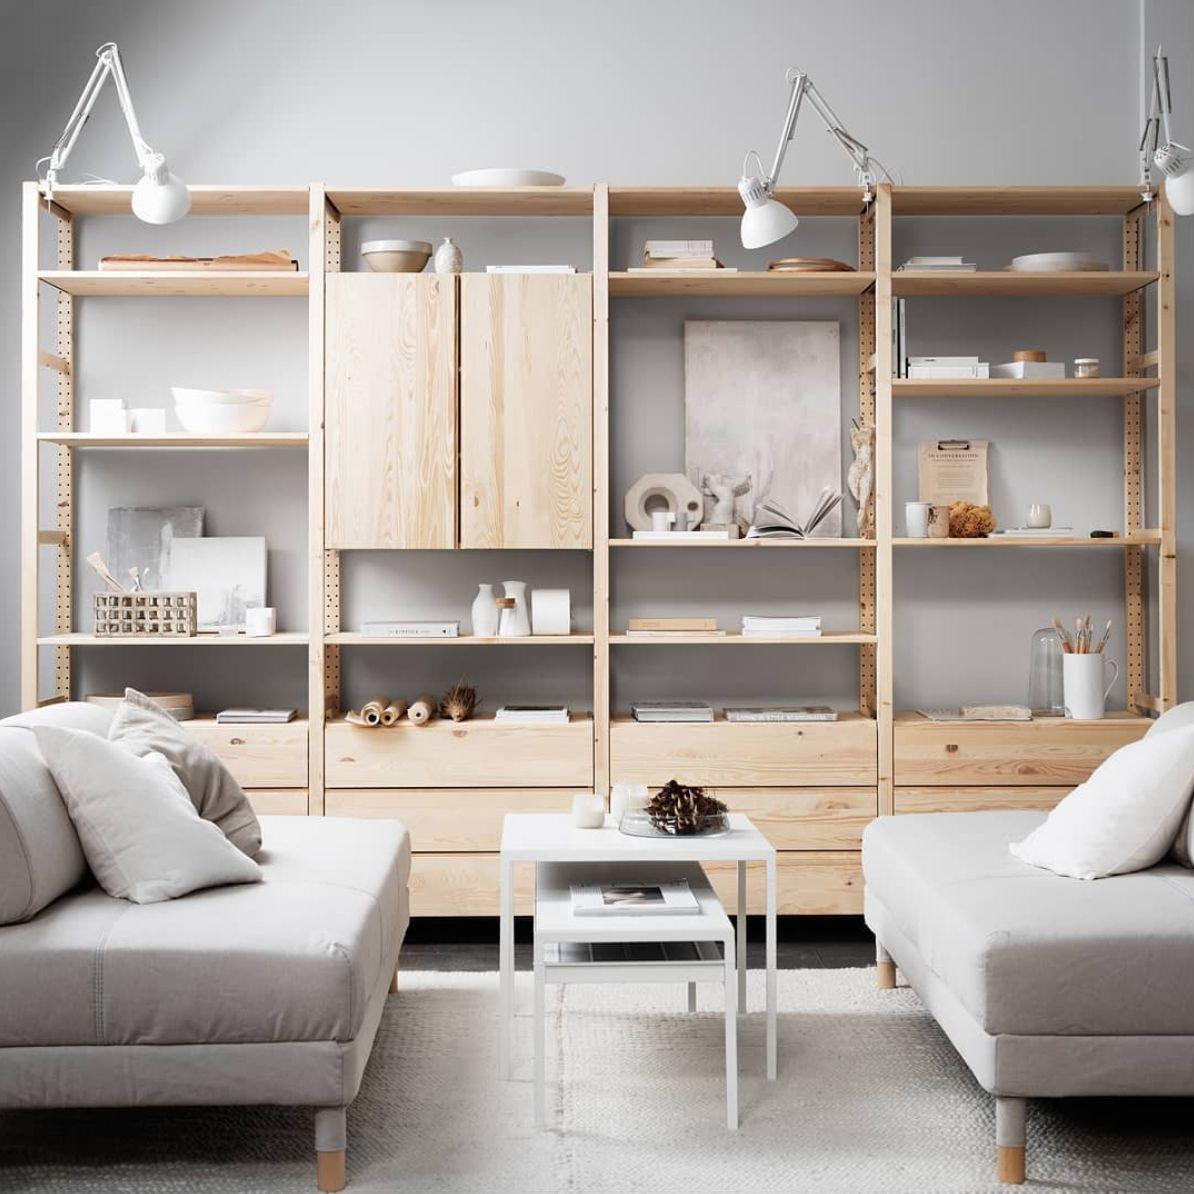 Nice 40 Ikea Furniture Ideas For Living Room Decor Http Decoraiso Com Index Php 2018 08 01 40 Ikea Furniture Ideas Ikea Living Room Ikea Interior Ikea Decor